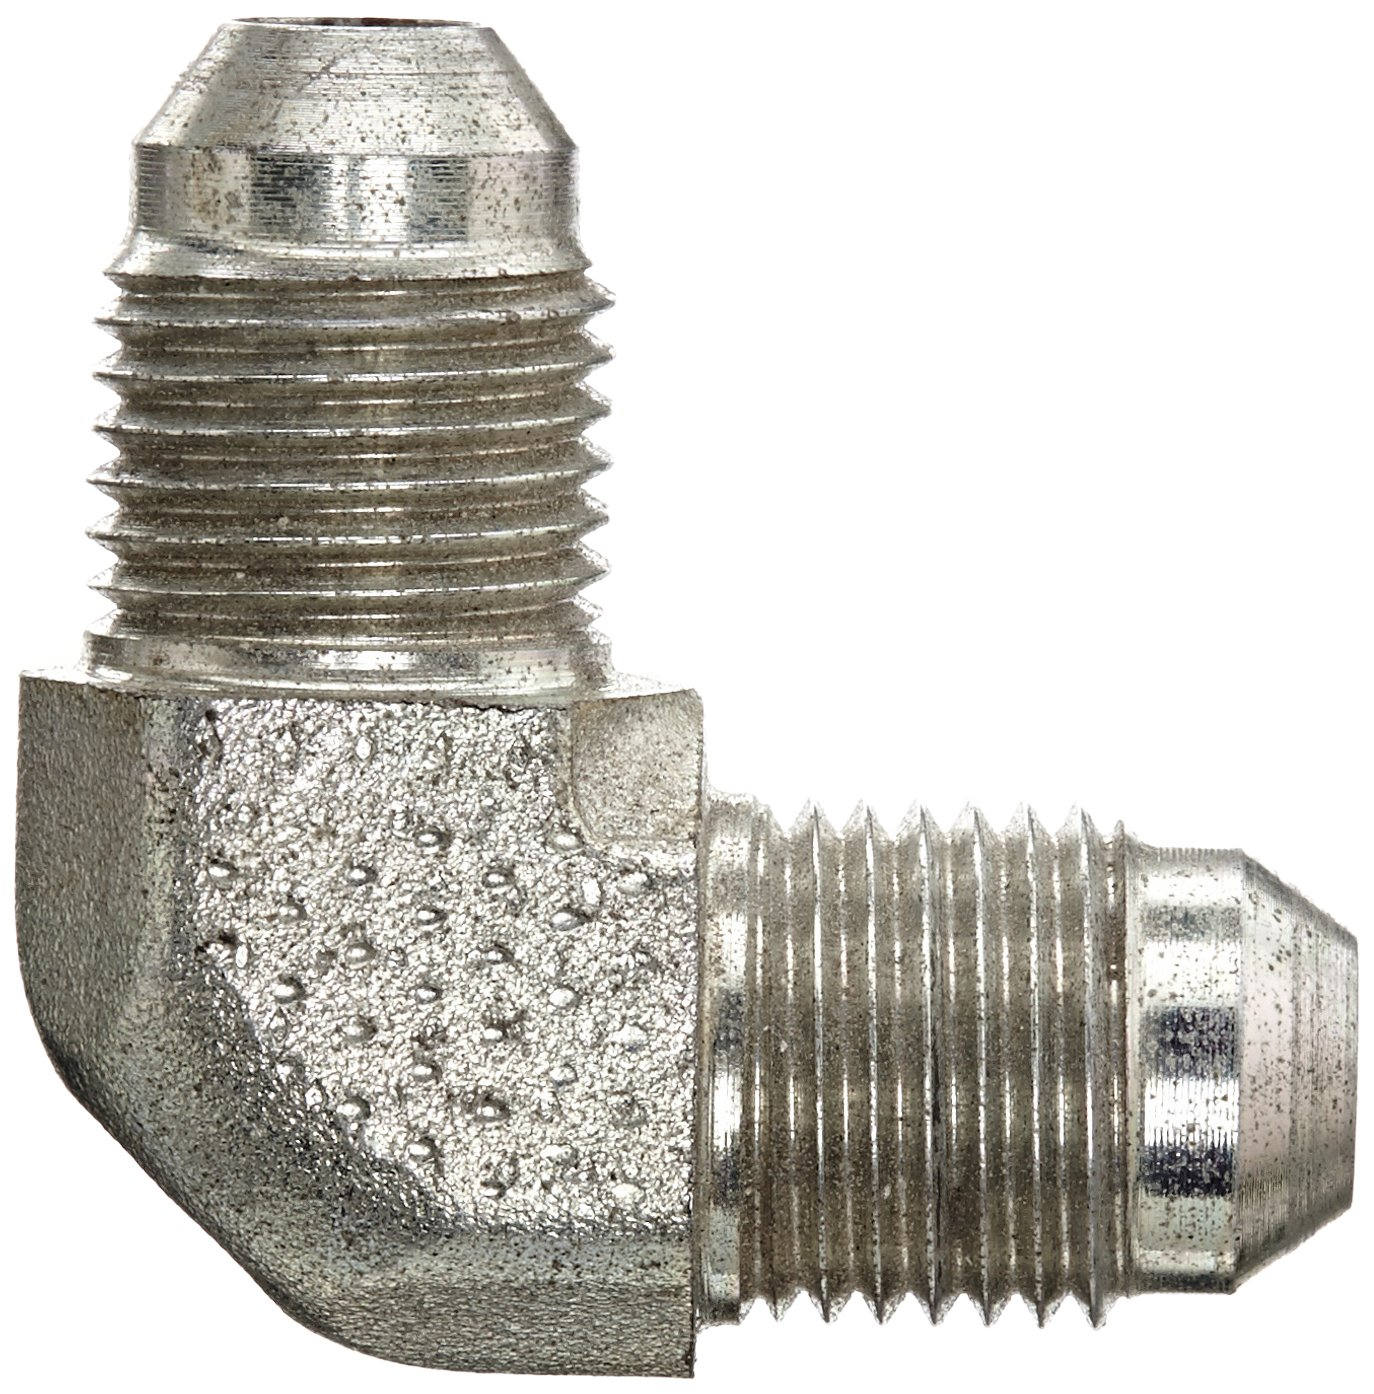 Eaton Aeroquip 2071-5-5S 90 Degree Swivel Nut Elbow End Size f m 5//16 Tube OD 5//16 Tube OD Carbon Steel x 5//16 JIC JIC 37 Degree End Types 5//16 JIC